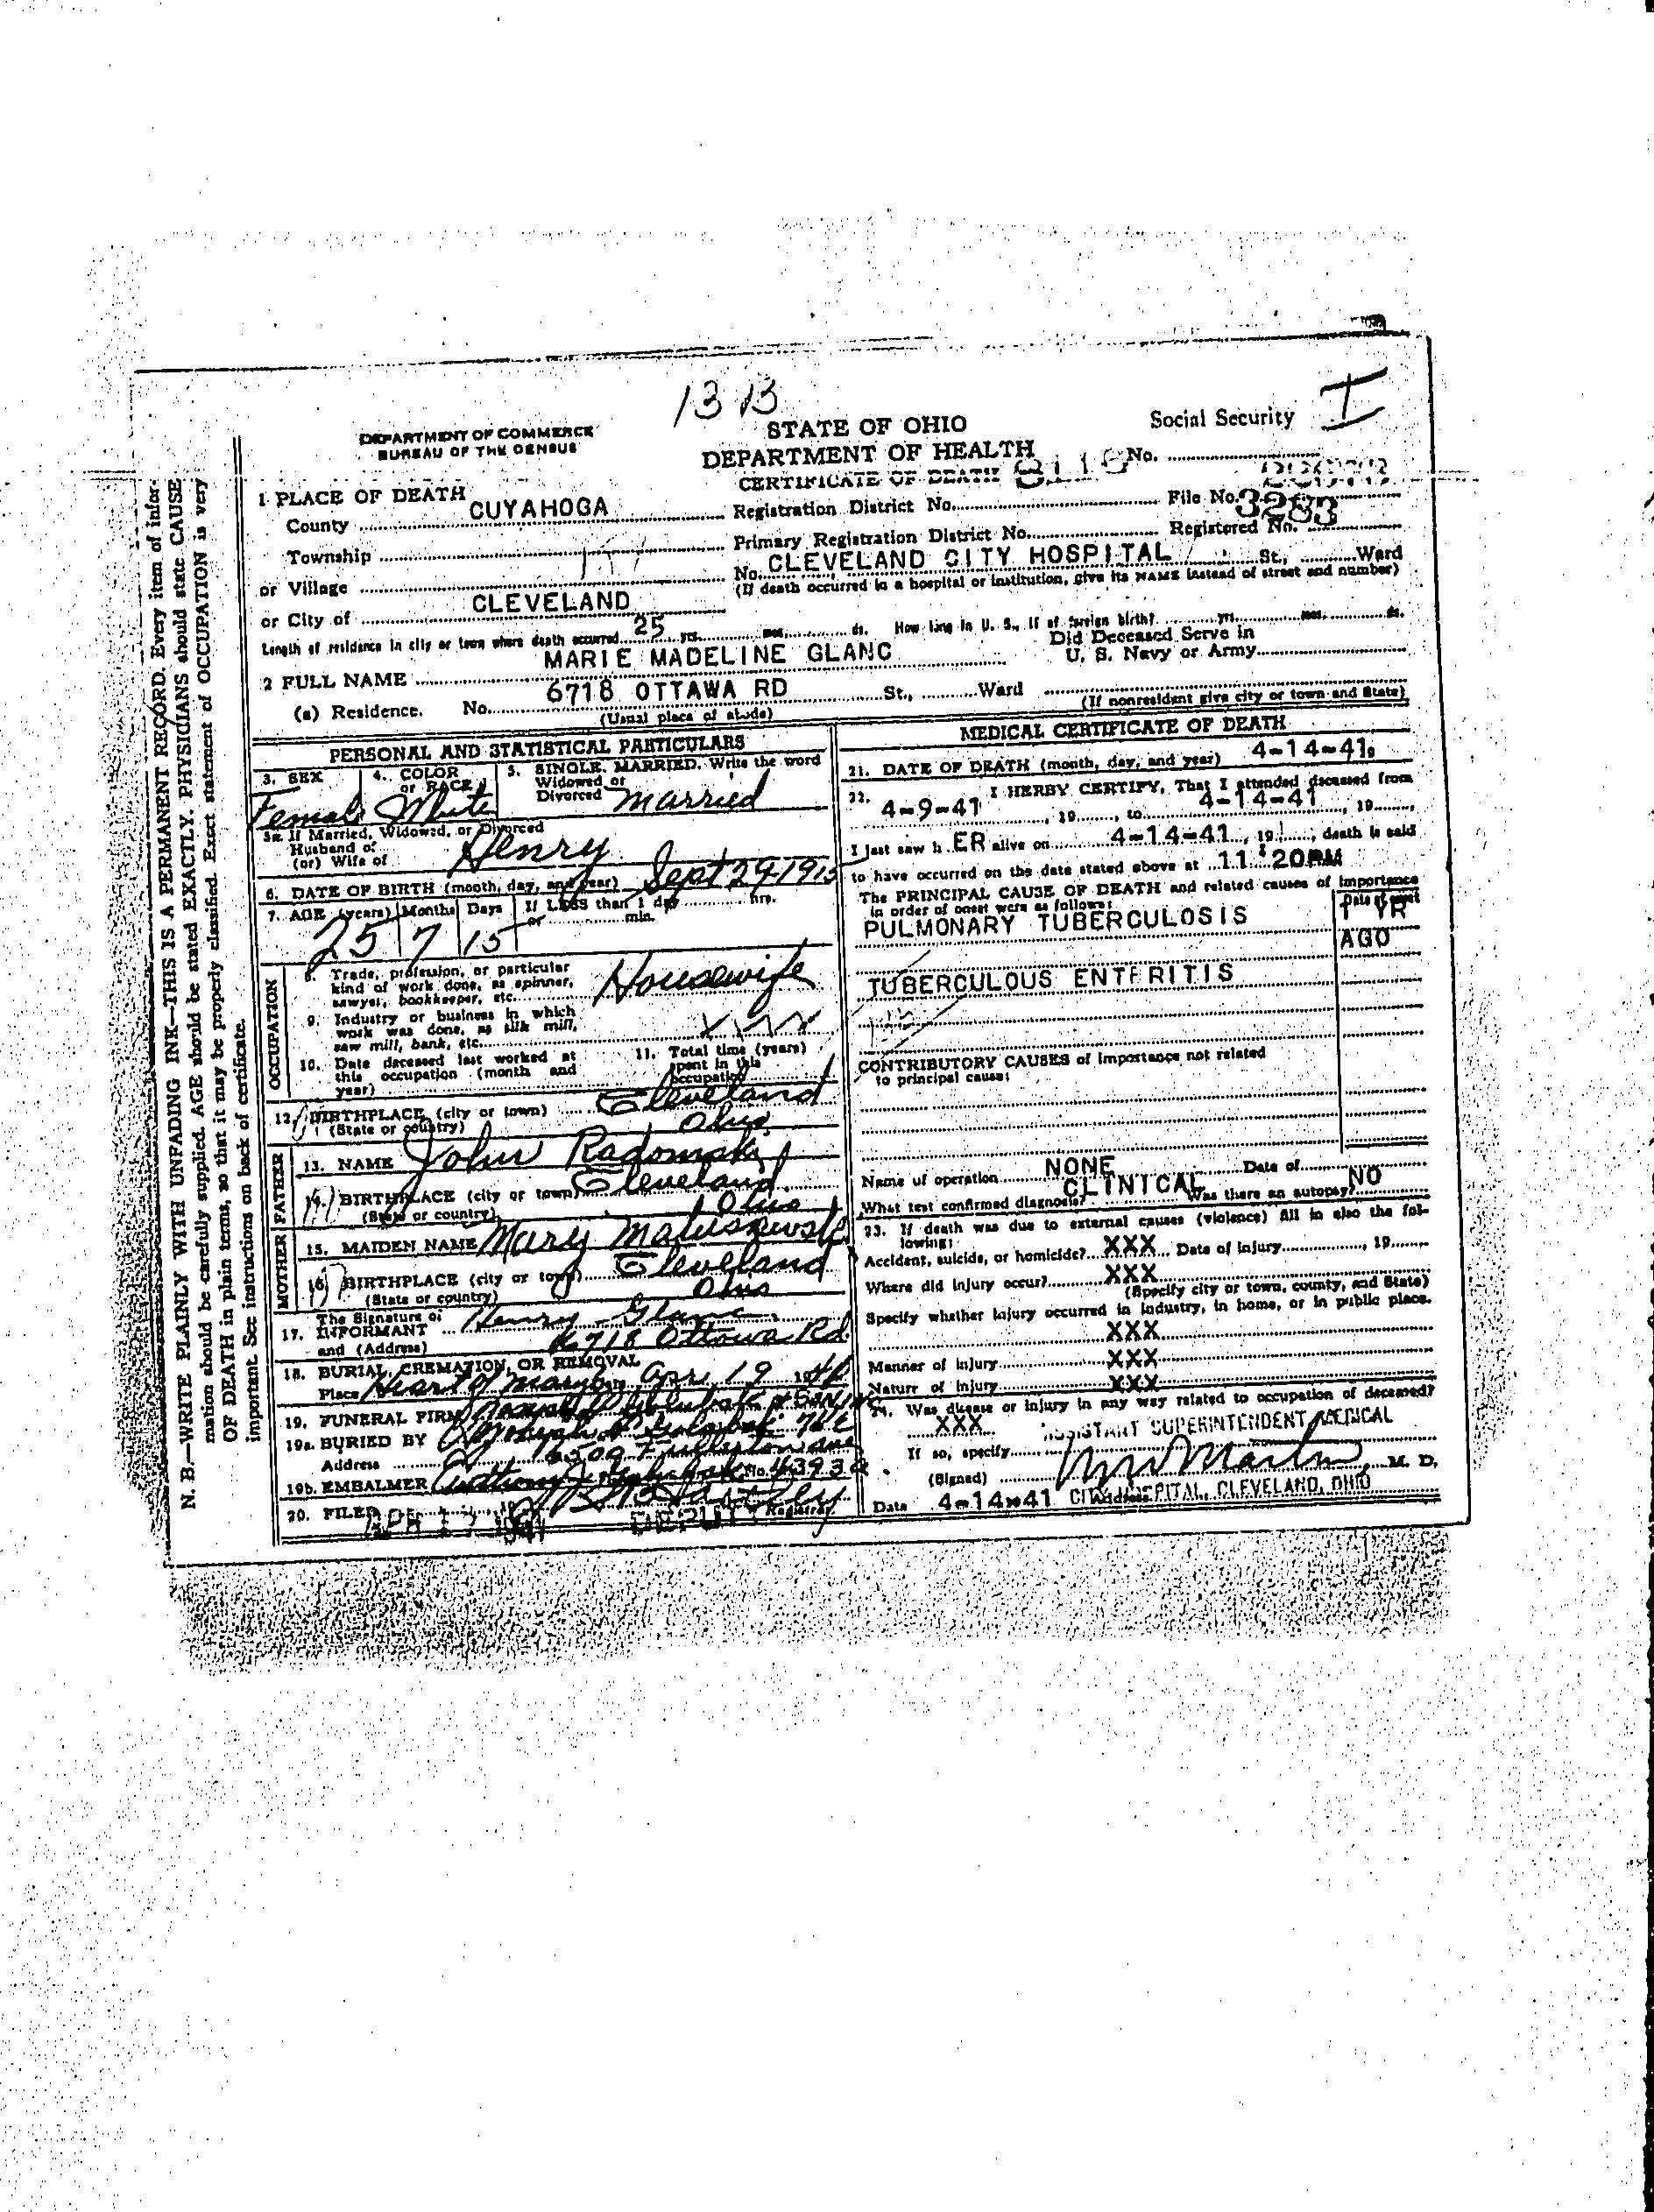 Marie Madeline Radomski Glanc Death Certificate Daughter Of John